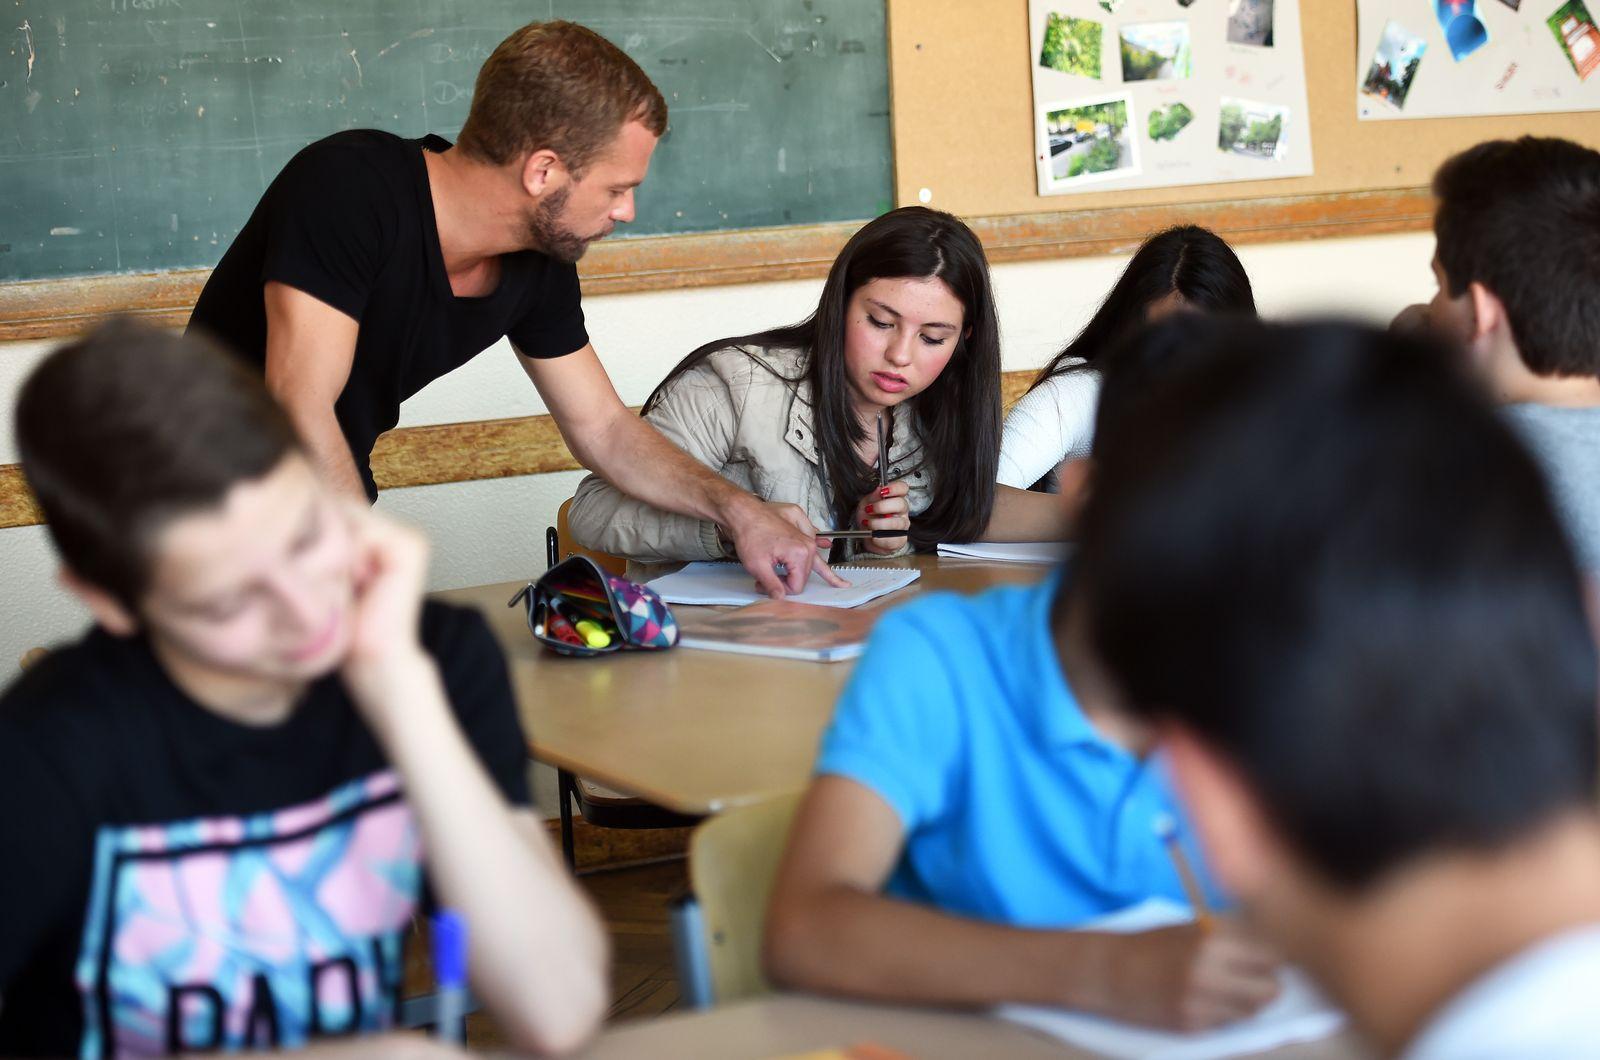 Flüchtlinge Schule Lehrer